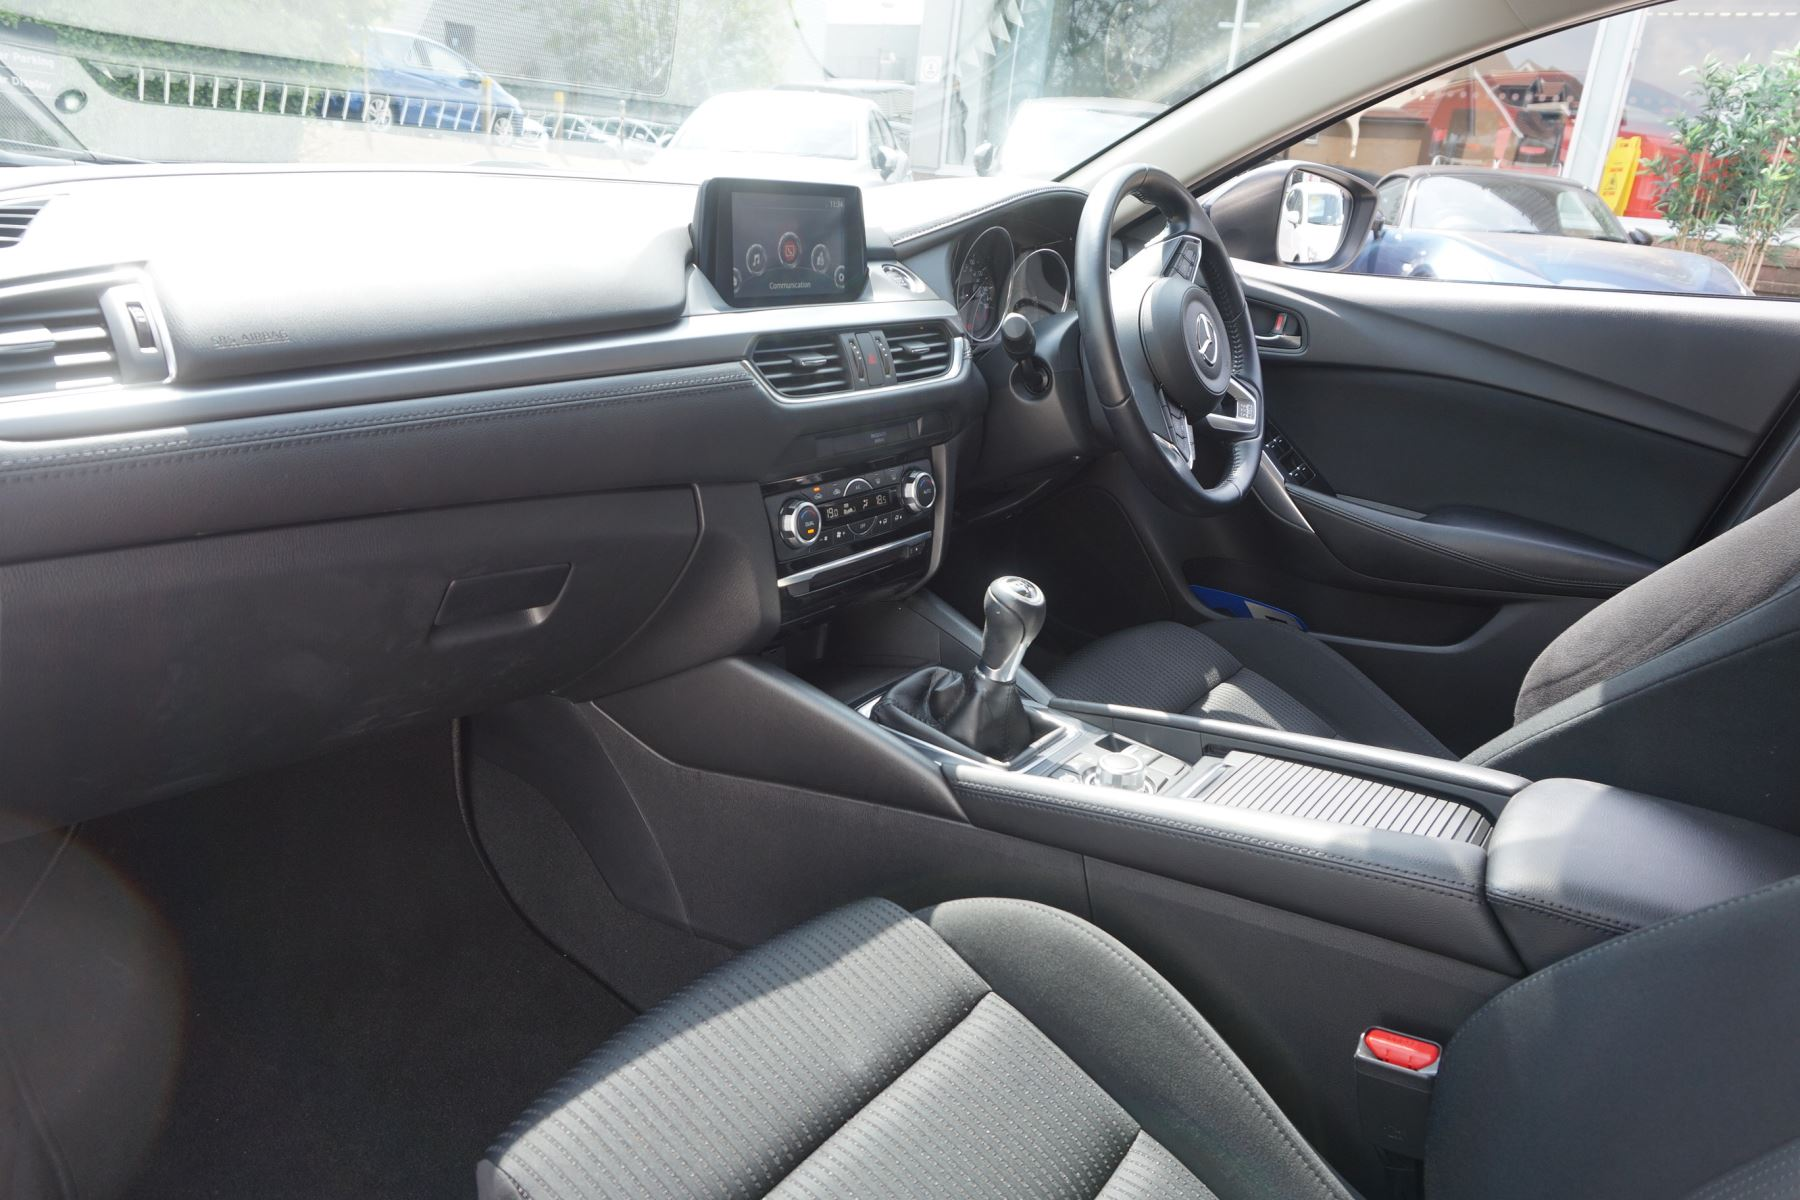 Mazda 6 2.2d SE-L Nav 4dr image 8